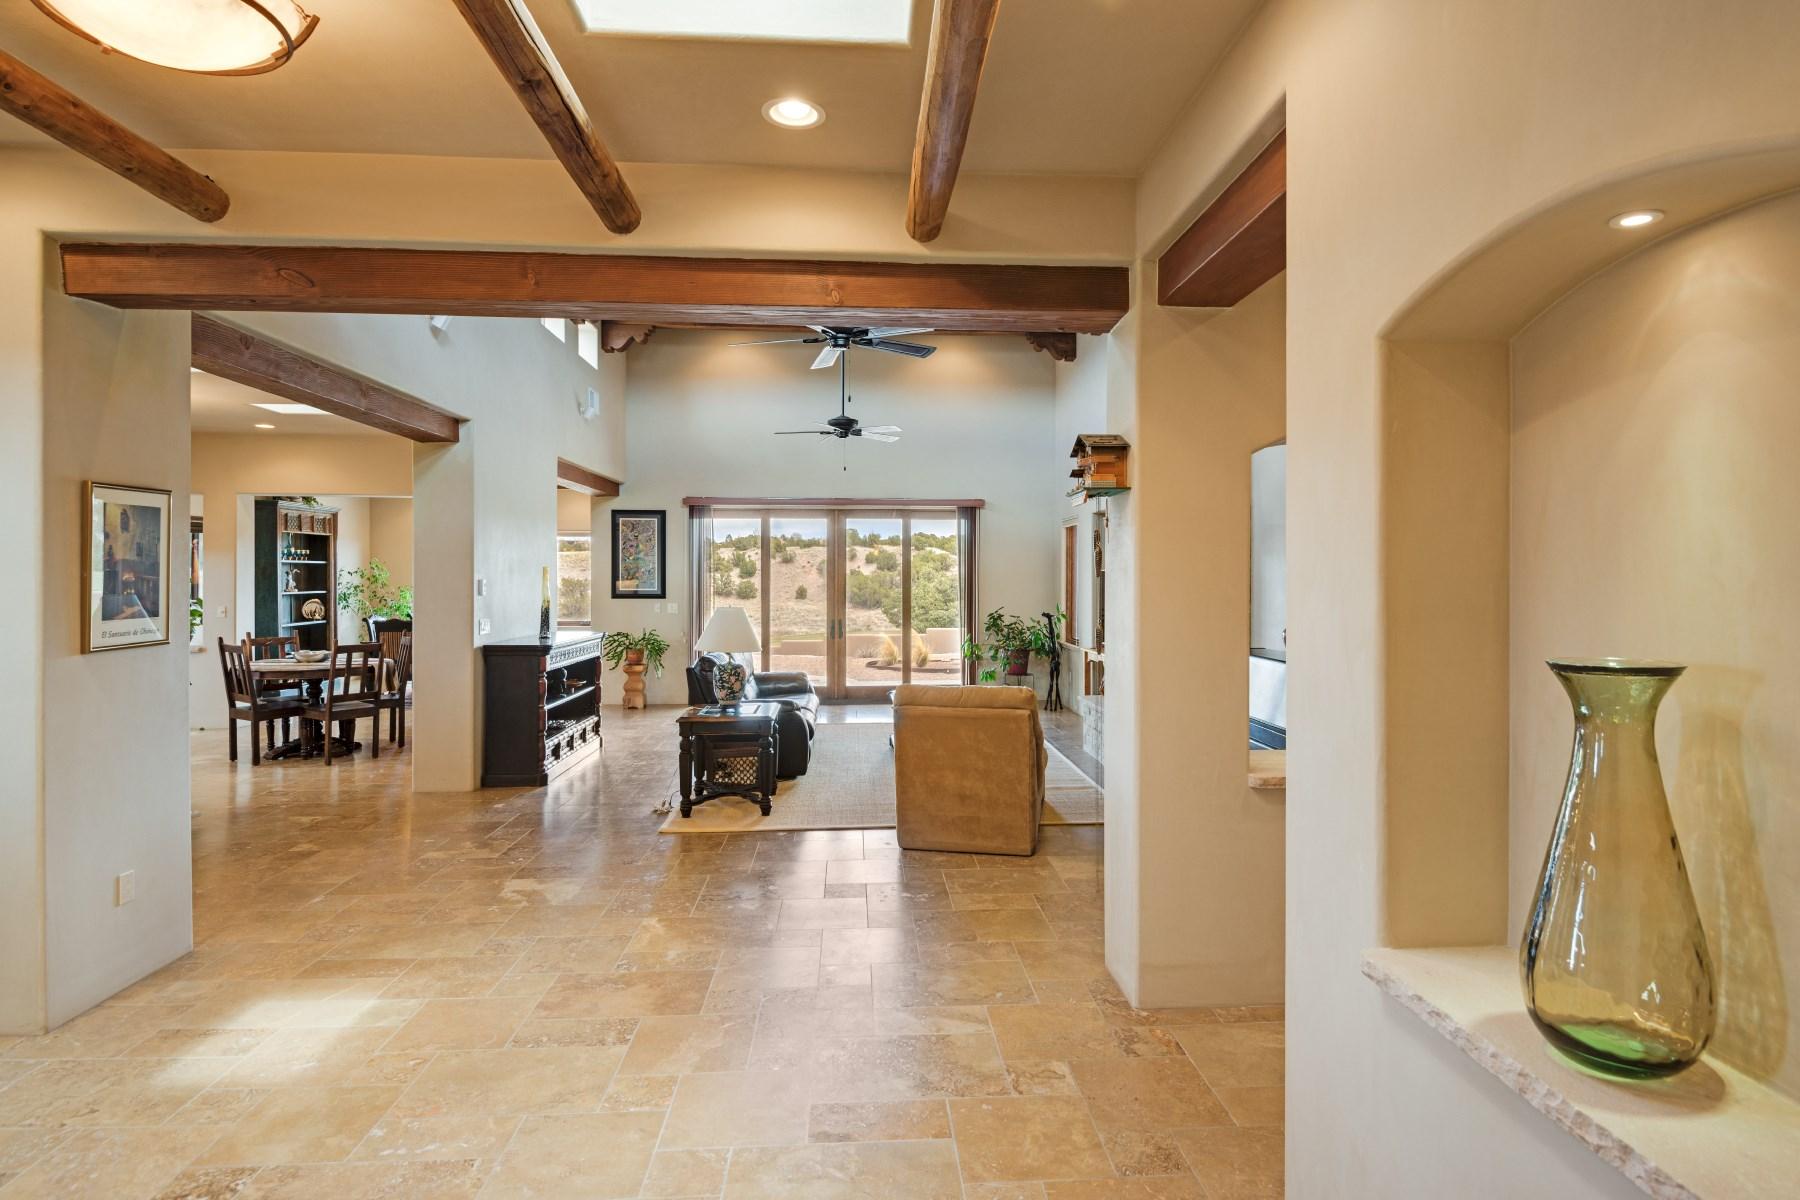 Single Family Home for Sale at 4 Plaza Ortega Las Campanas & Los Santeros, Santa Fe, New Mexico, 87506 United States